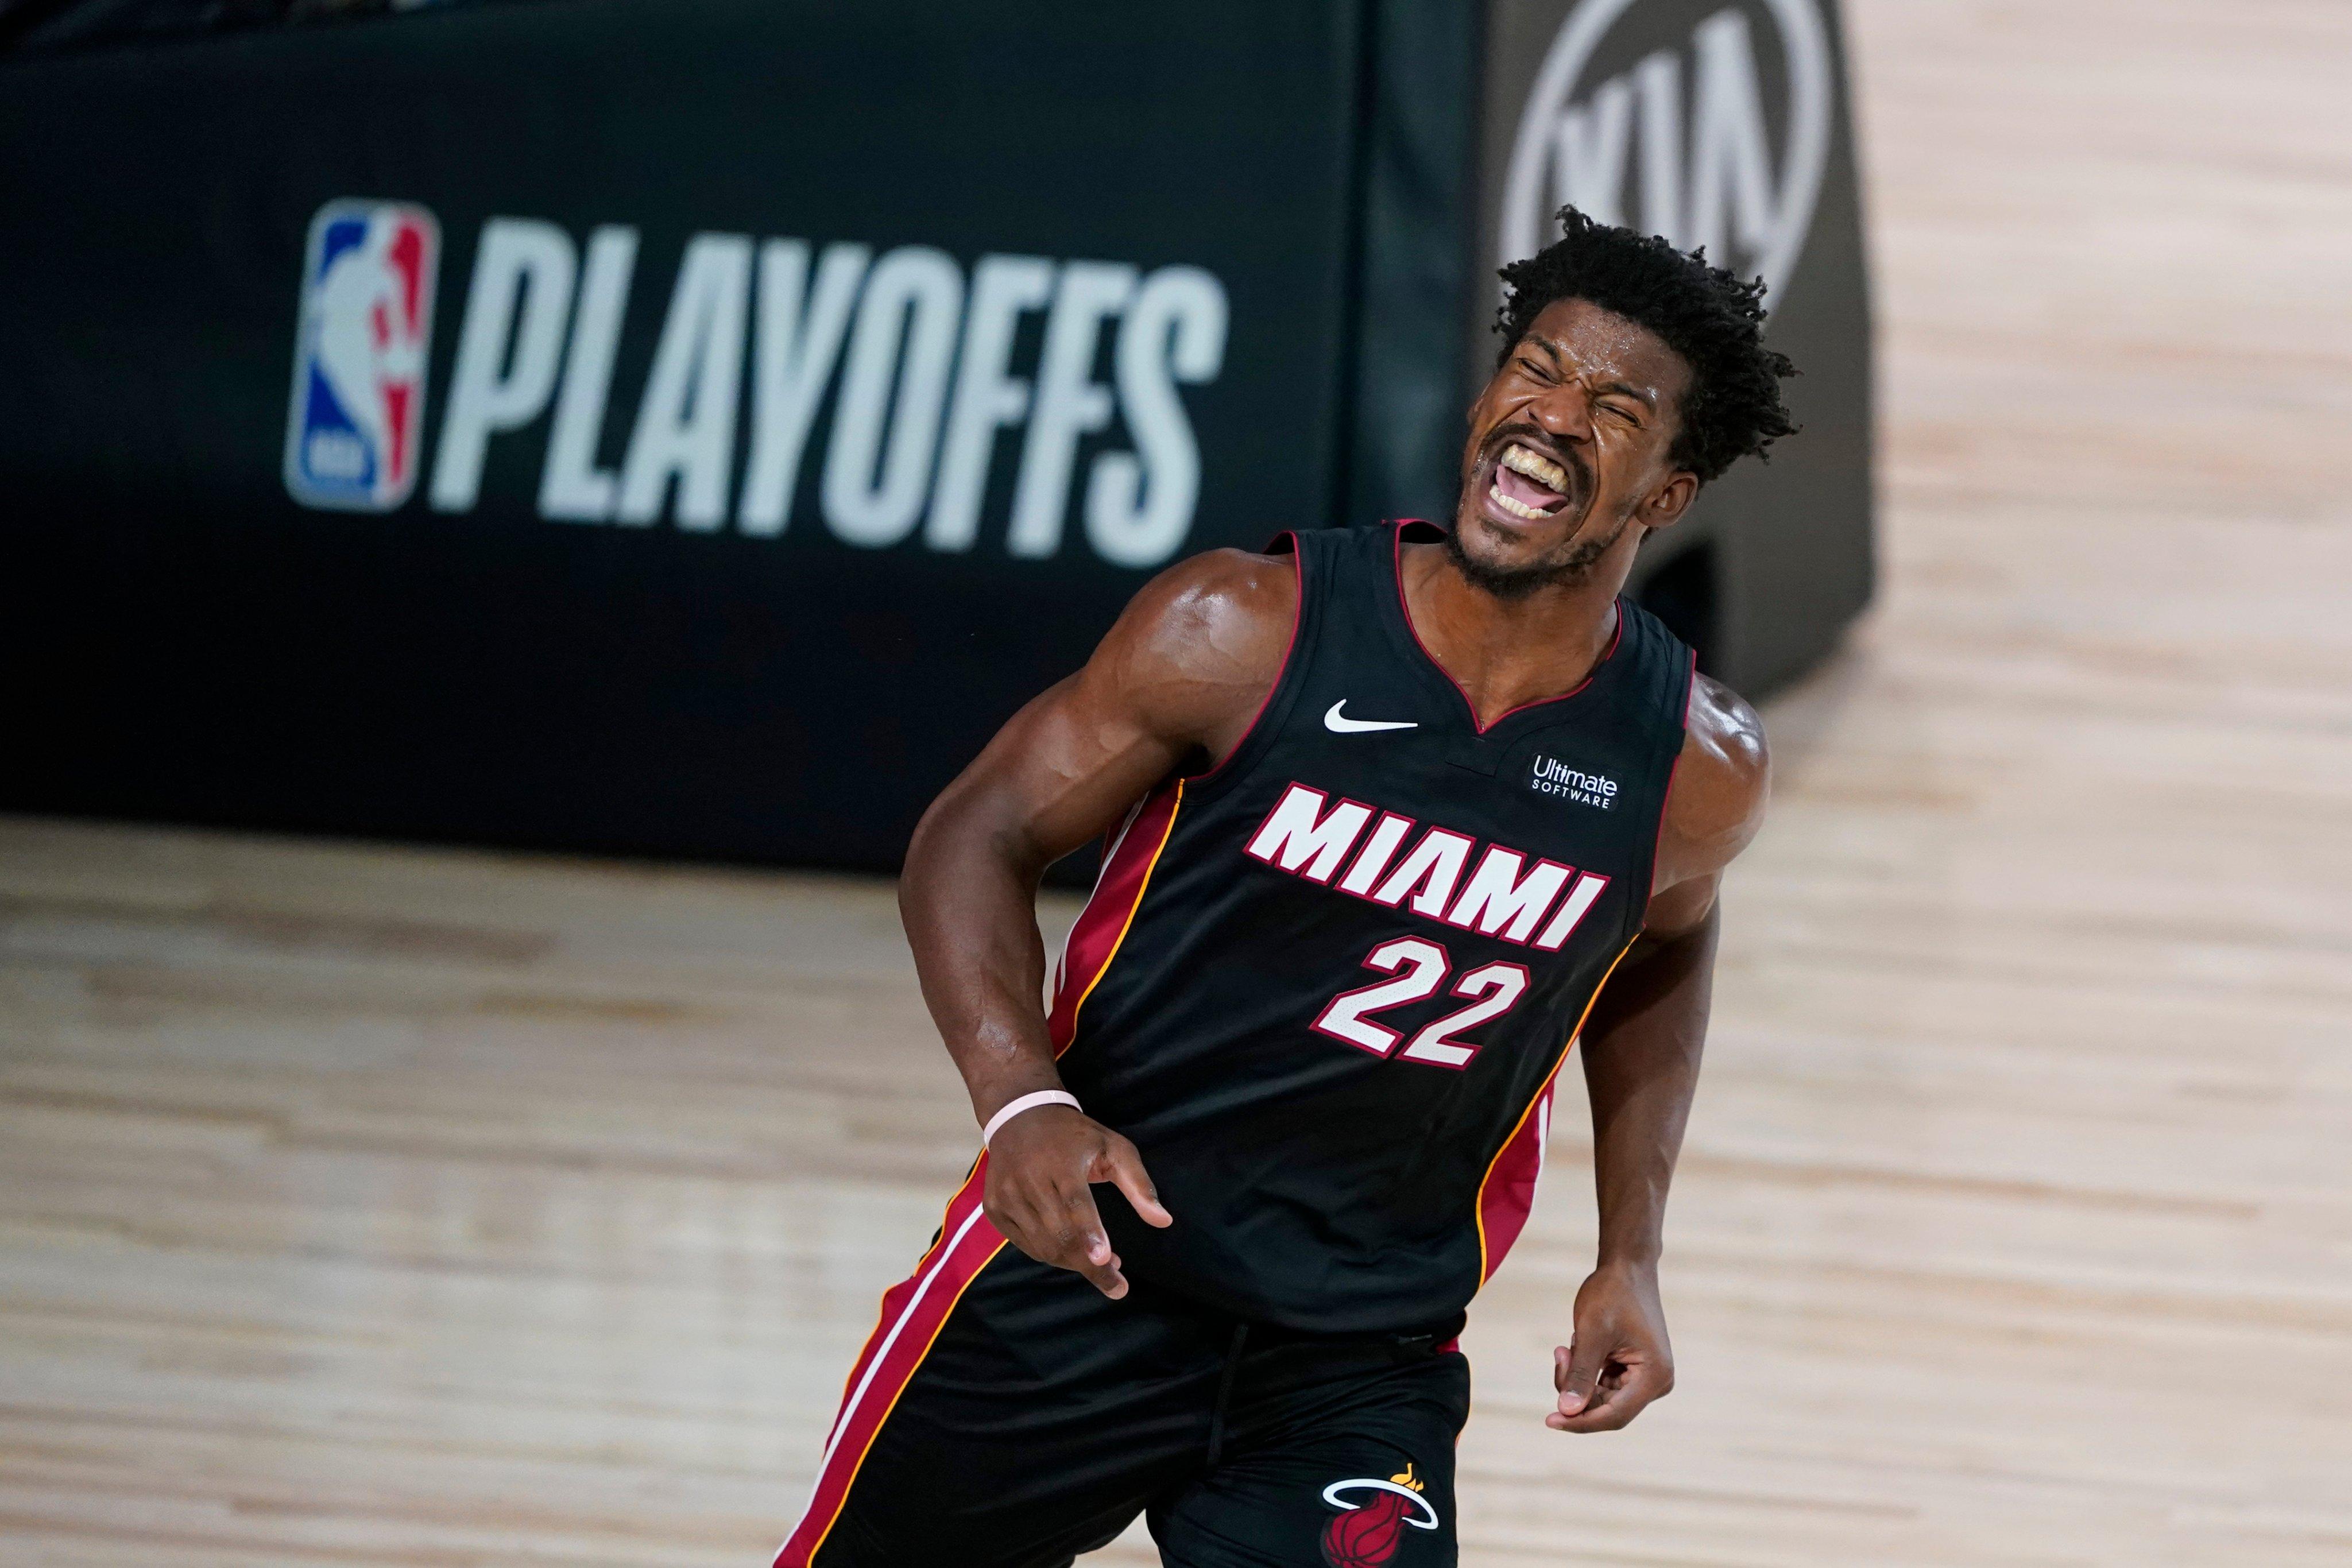 4) Miami Heat